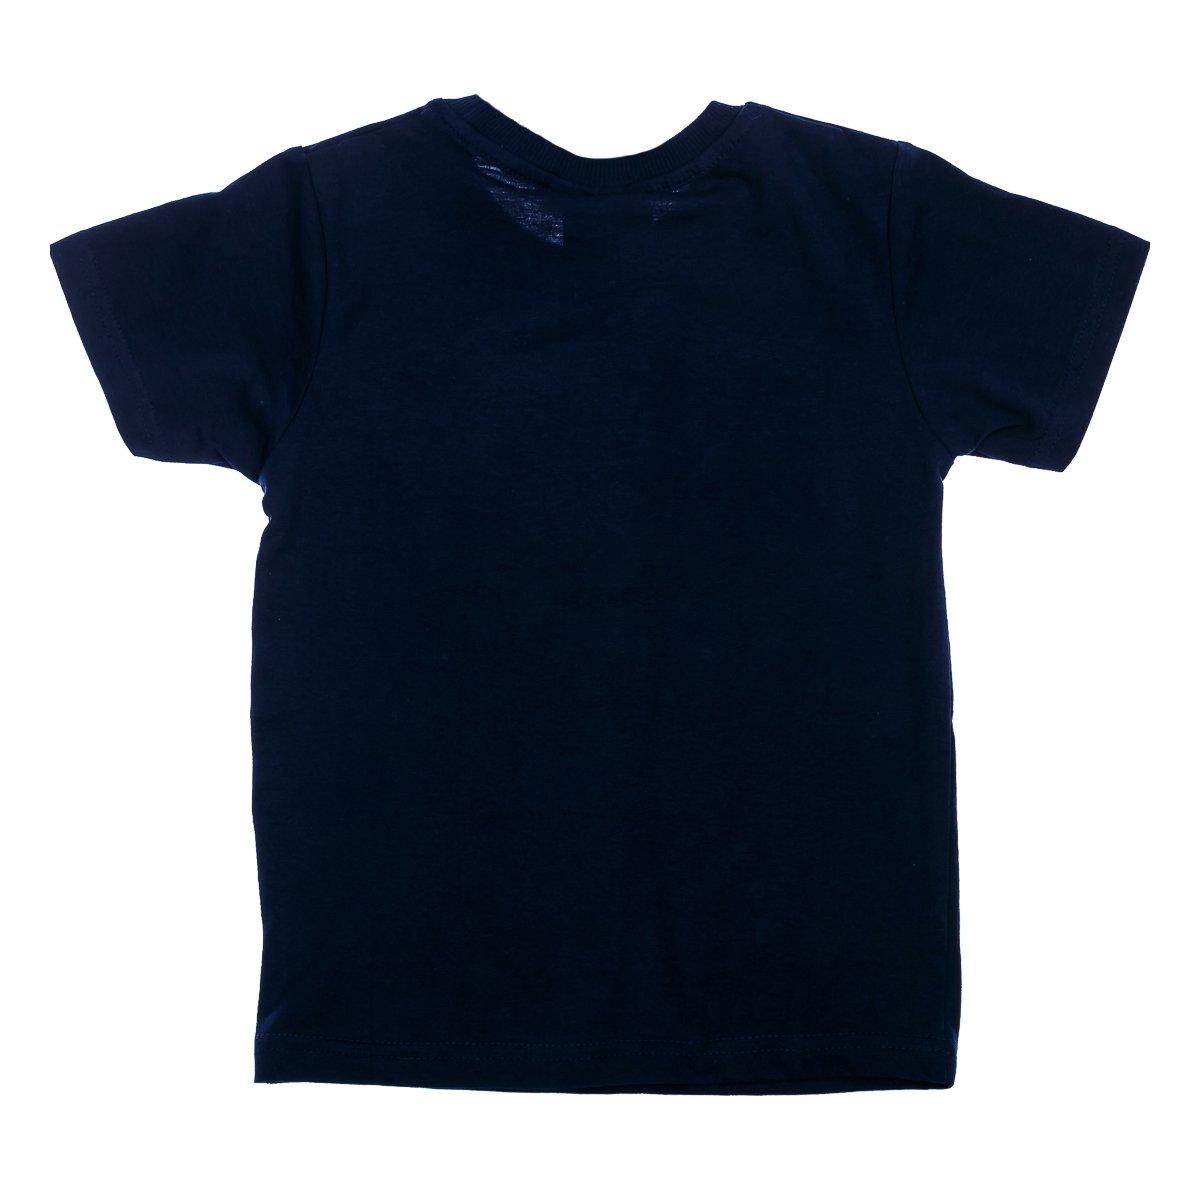 Купить Футболки, майки, топы, туники, Футболка E Plus M Batman Blue, р. 128 BAT5202184 ТМ: E Plus M, синий